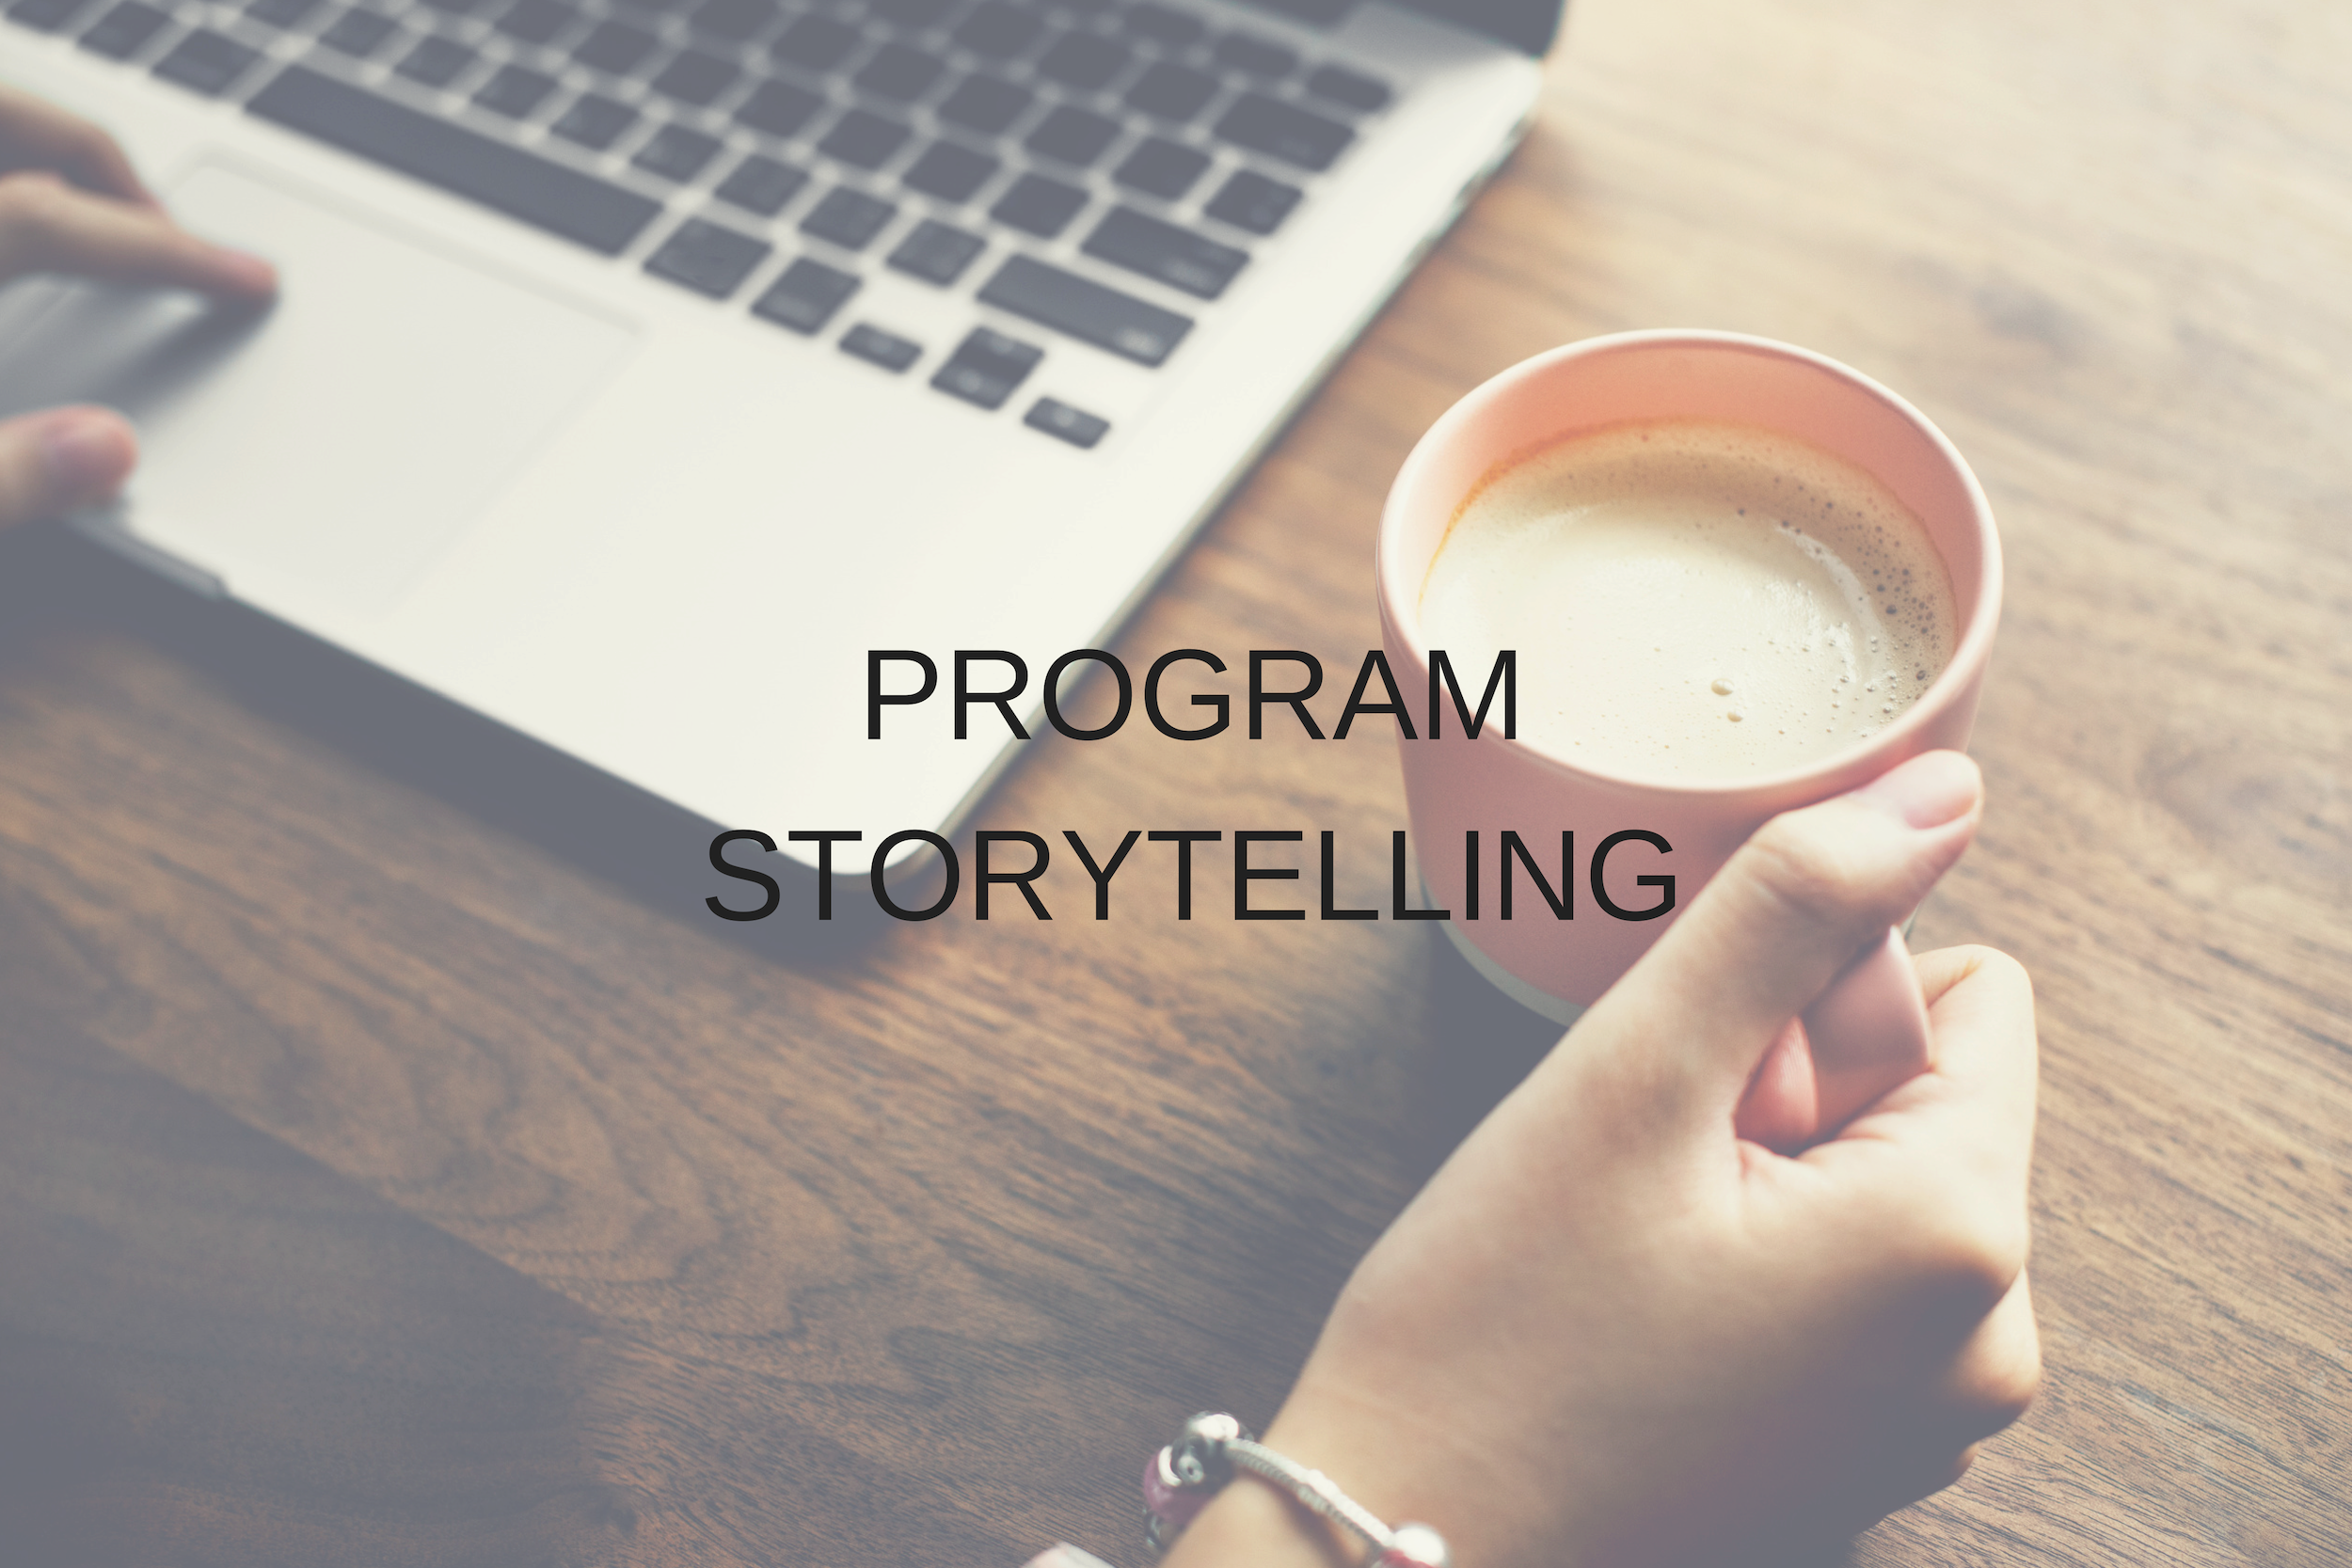 Program Storytelling - ministry.png